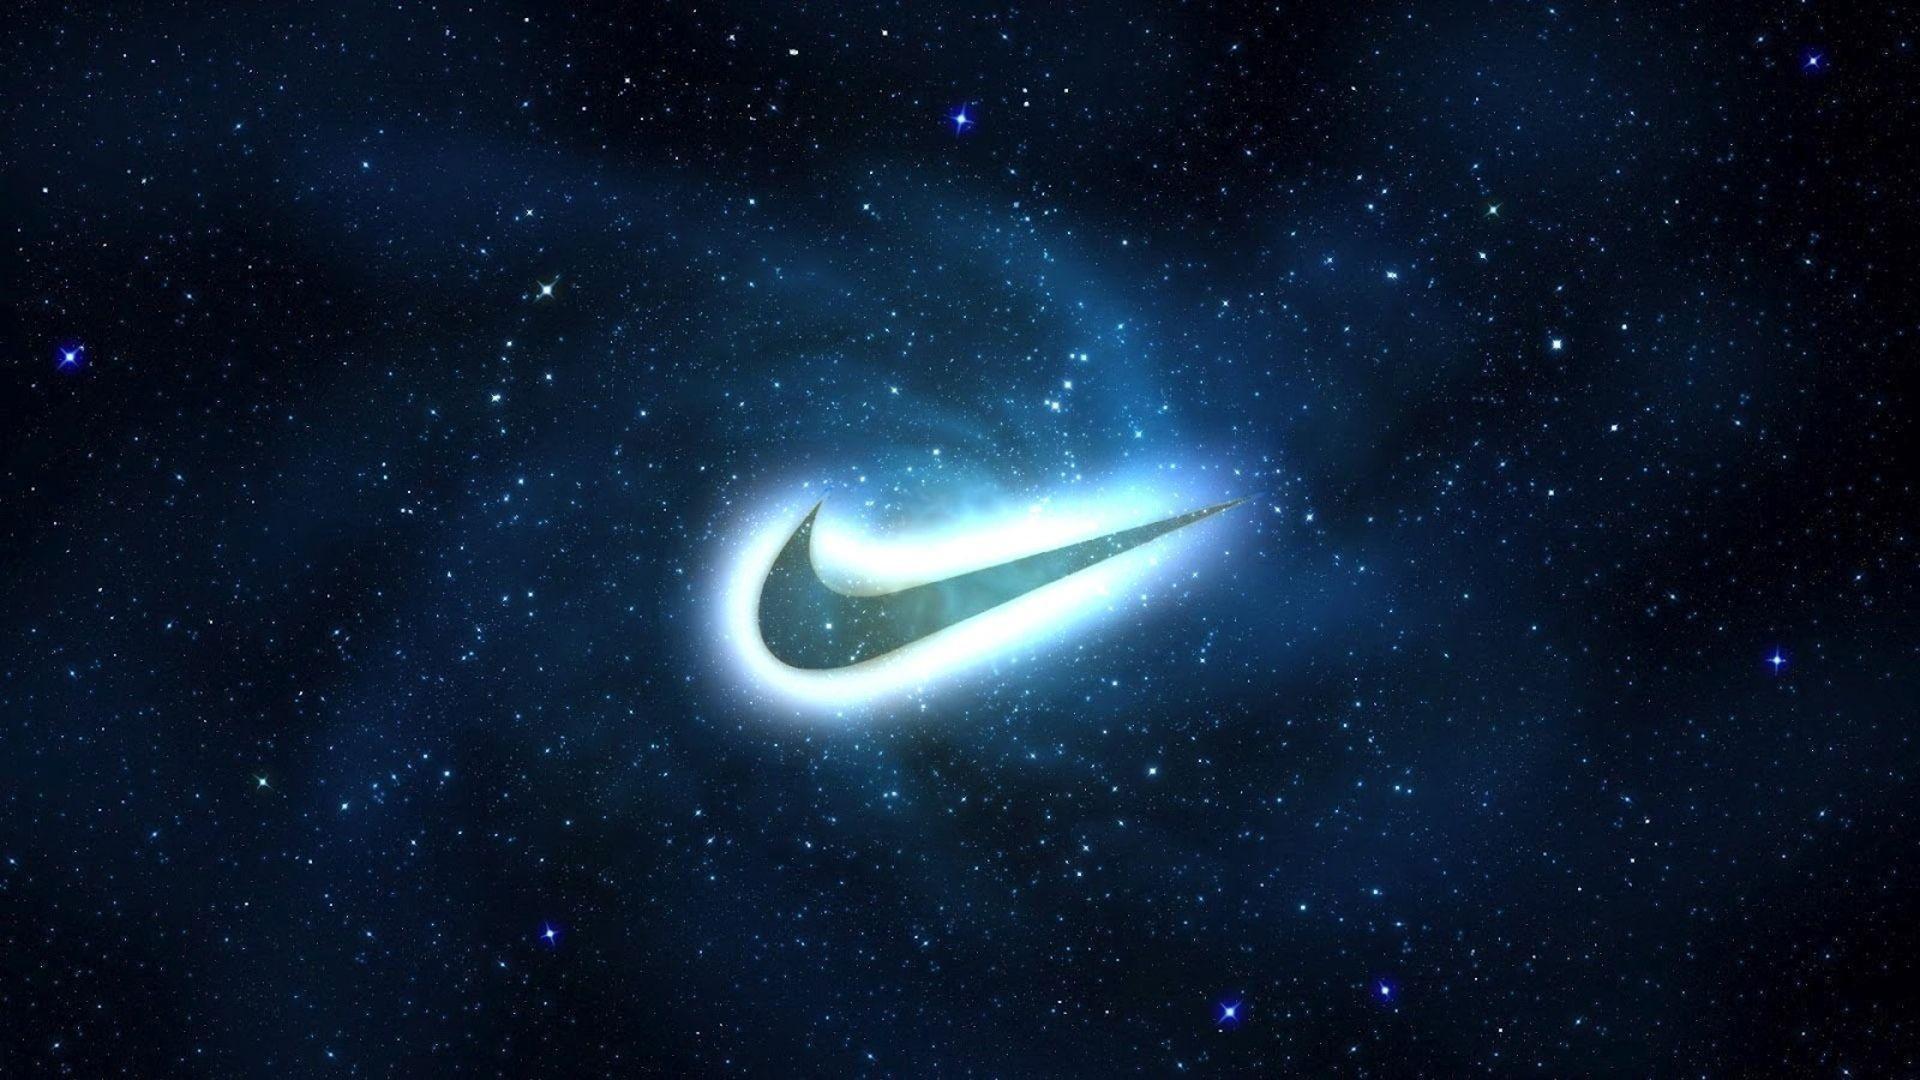 Nike Wallpaper Cool Image C7 – zaitoona.com